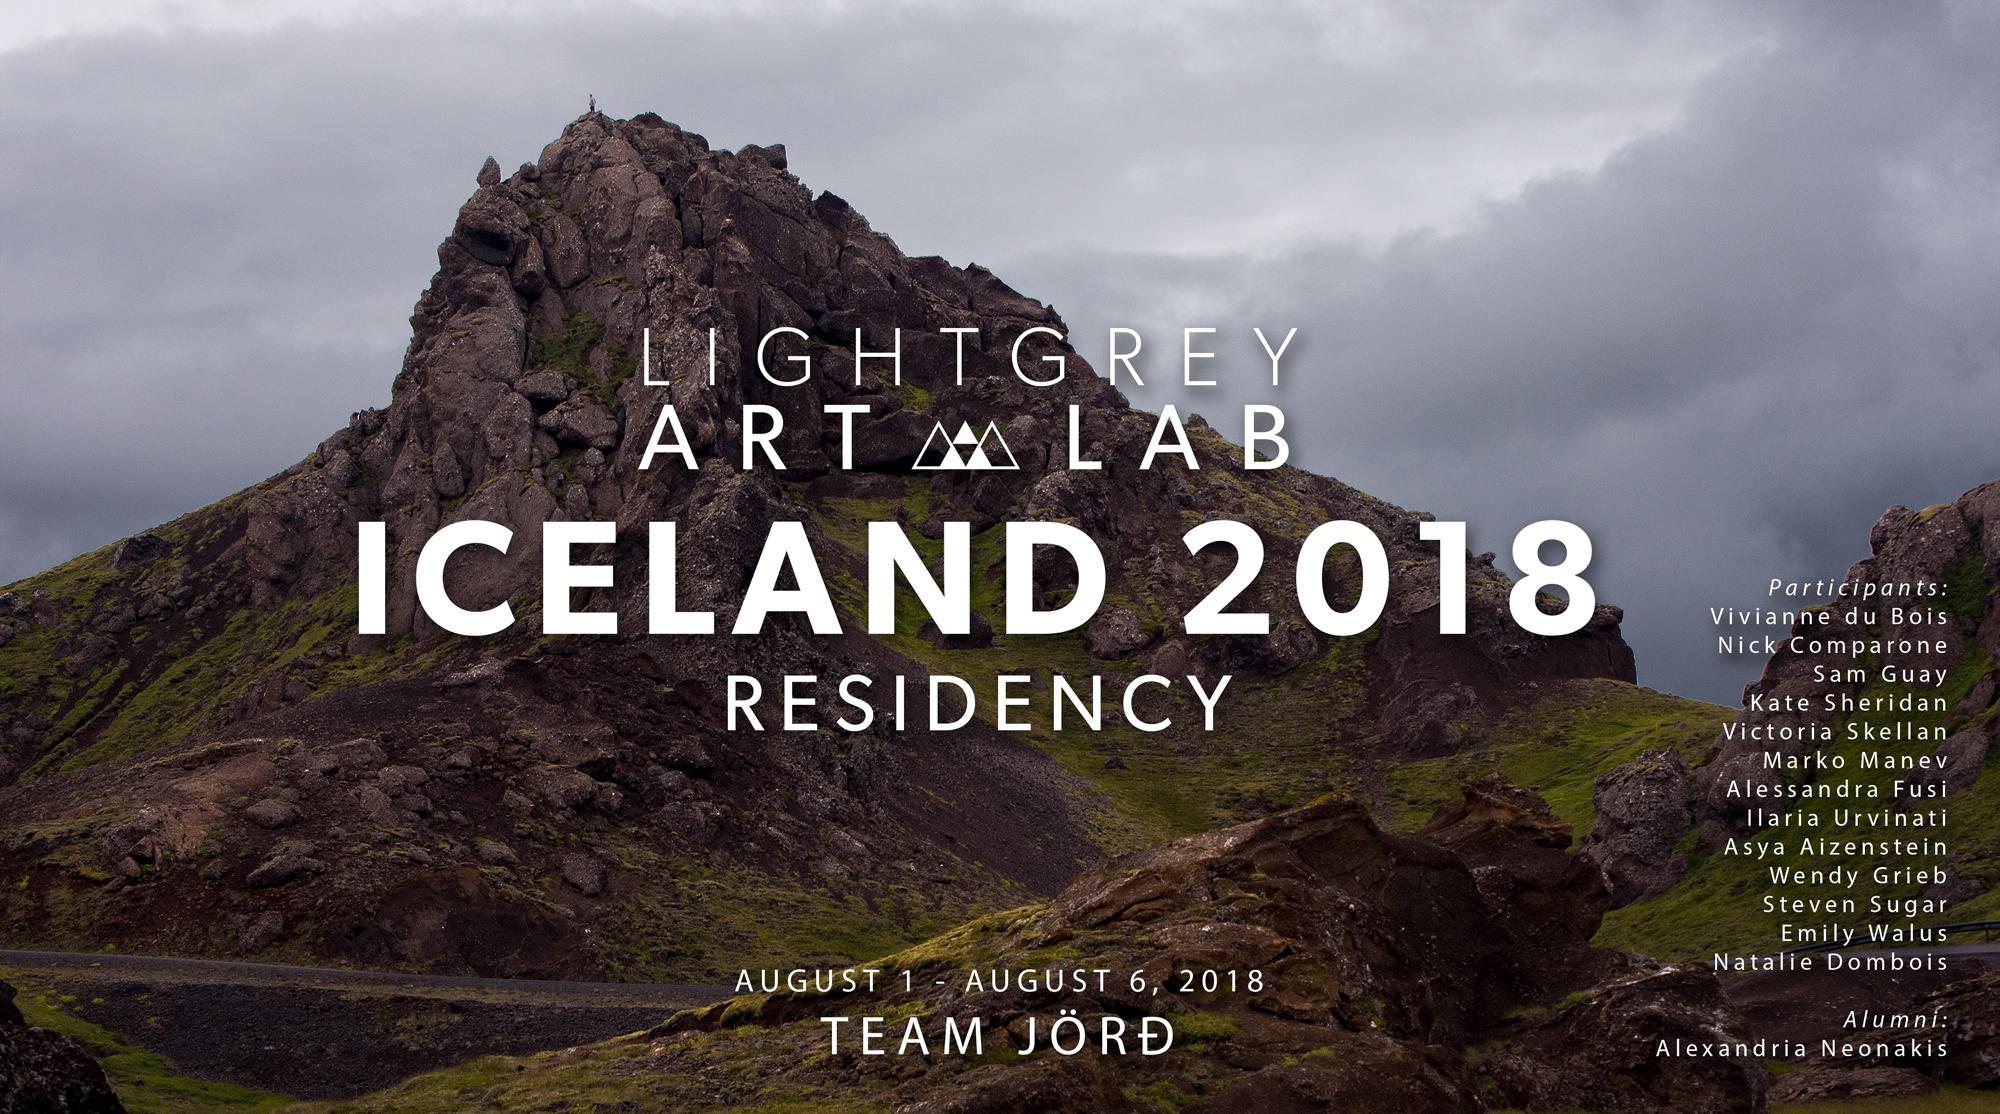 Team_Jord_1.jpg